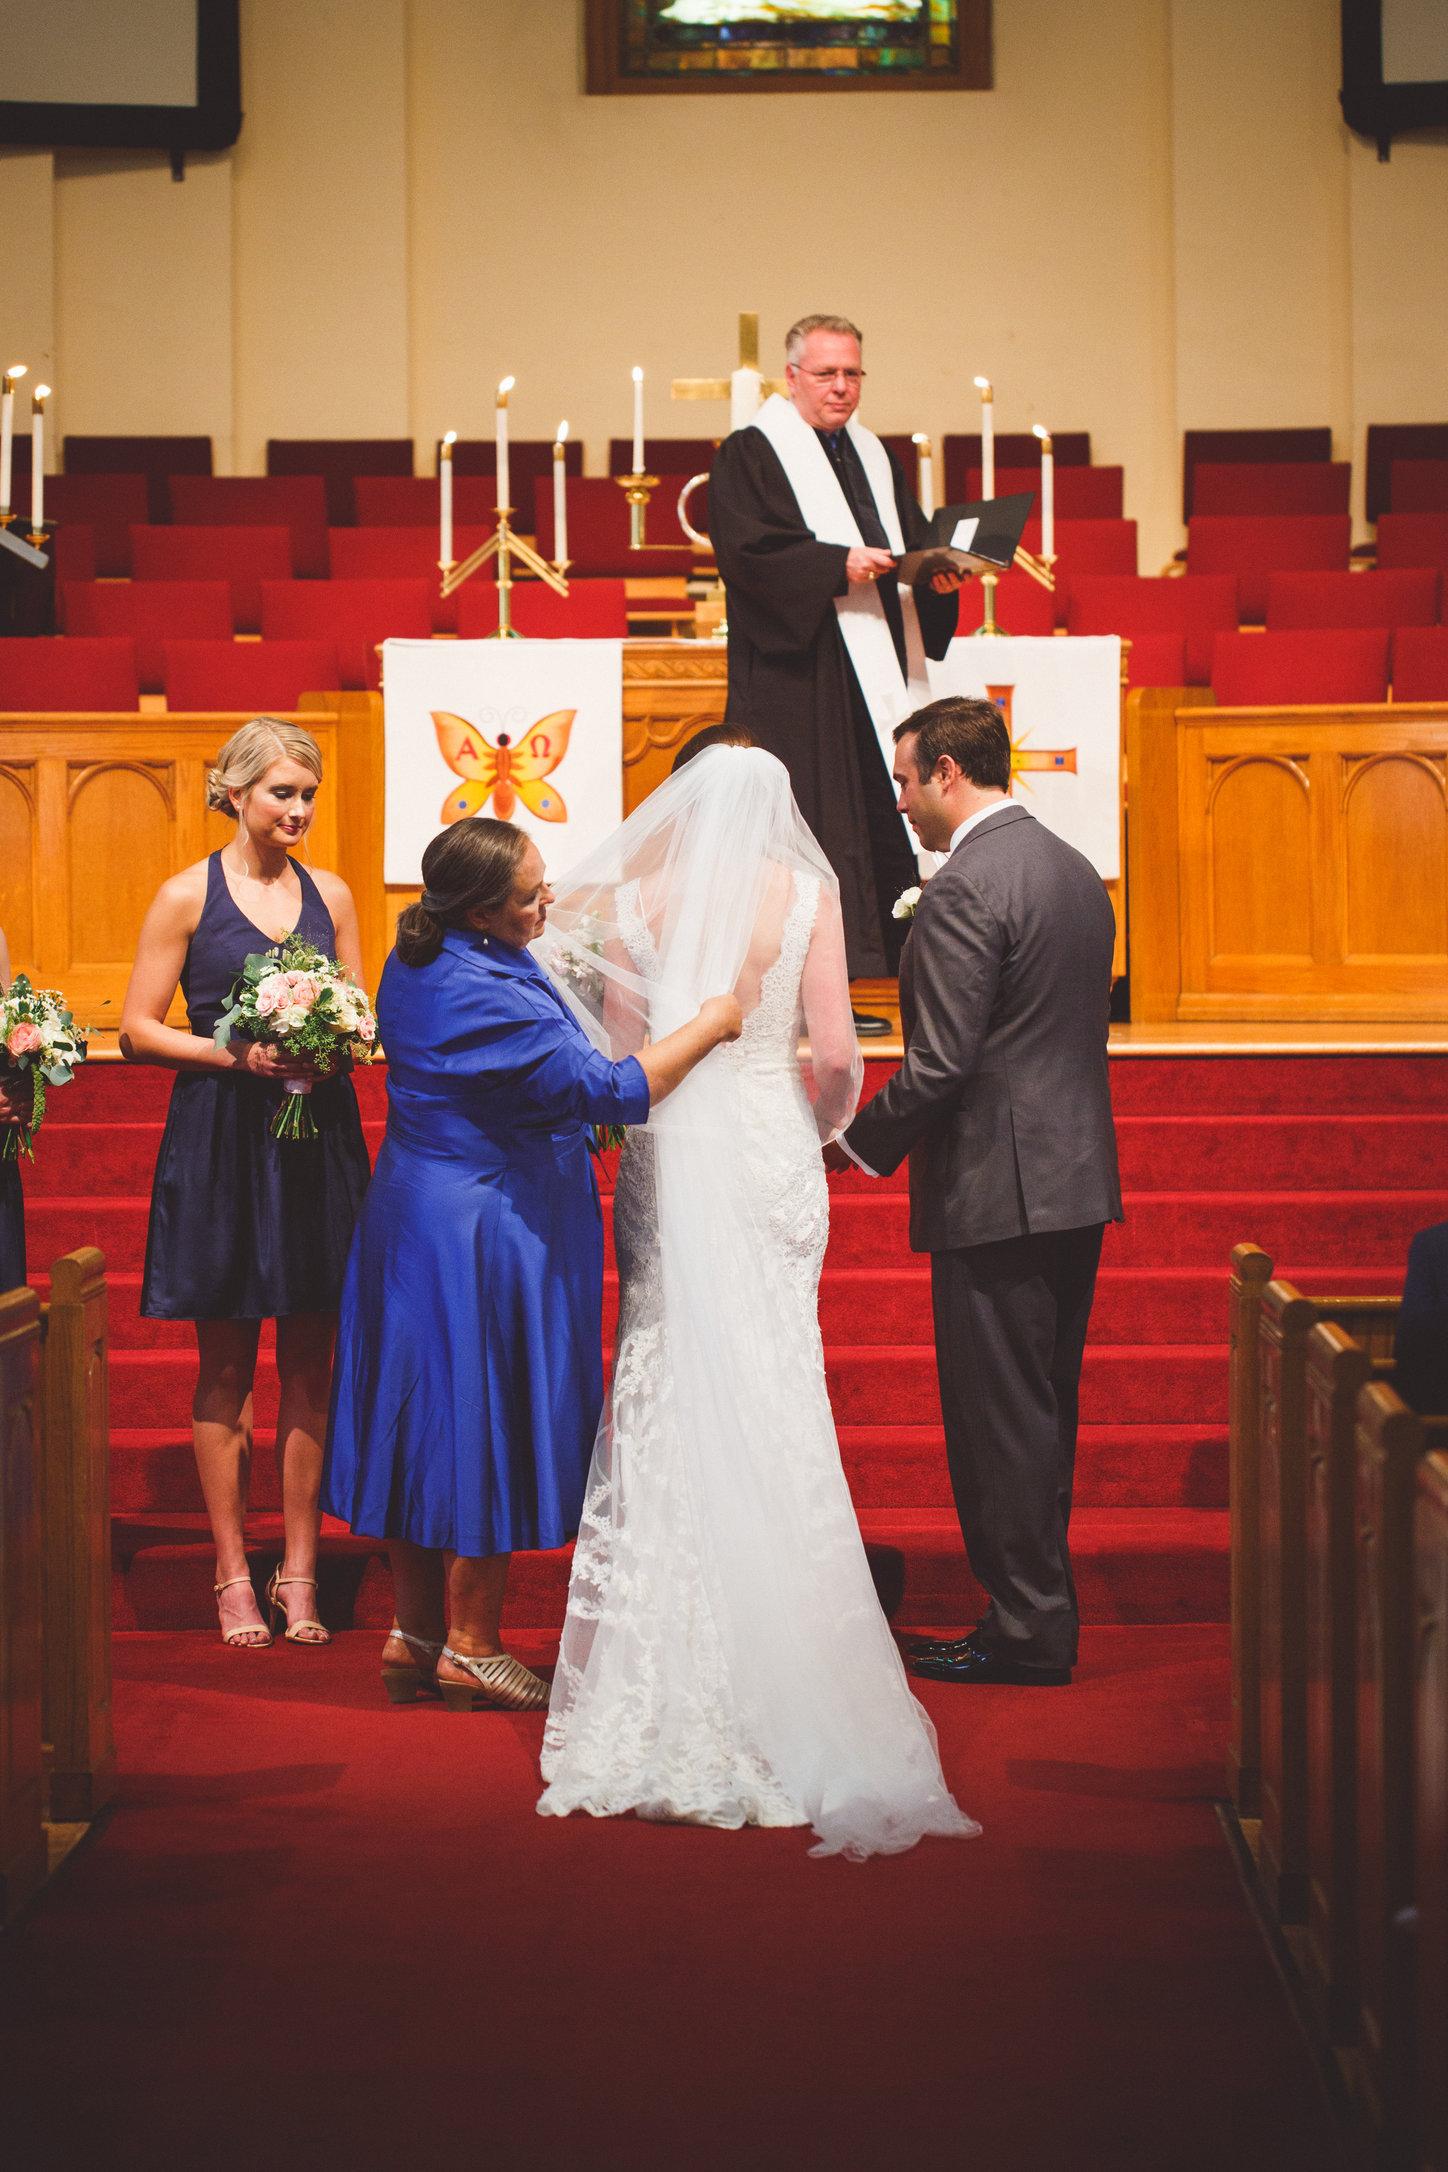 SandC-wedding-176.jpg